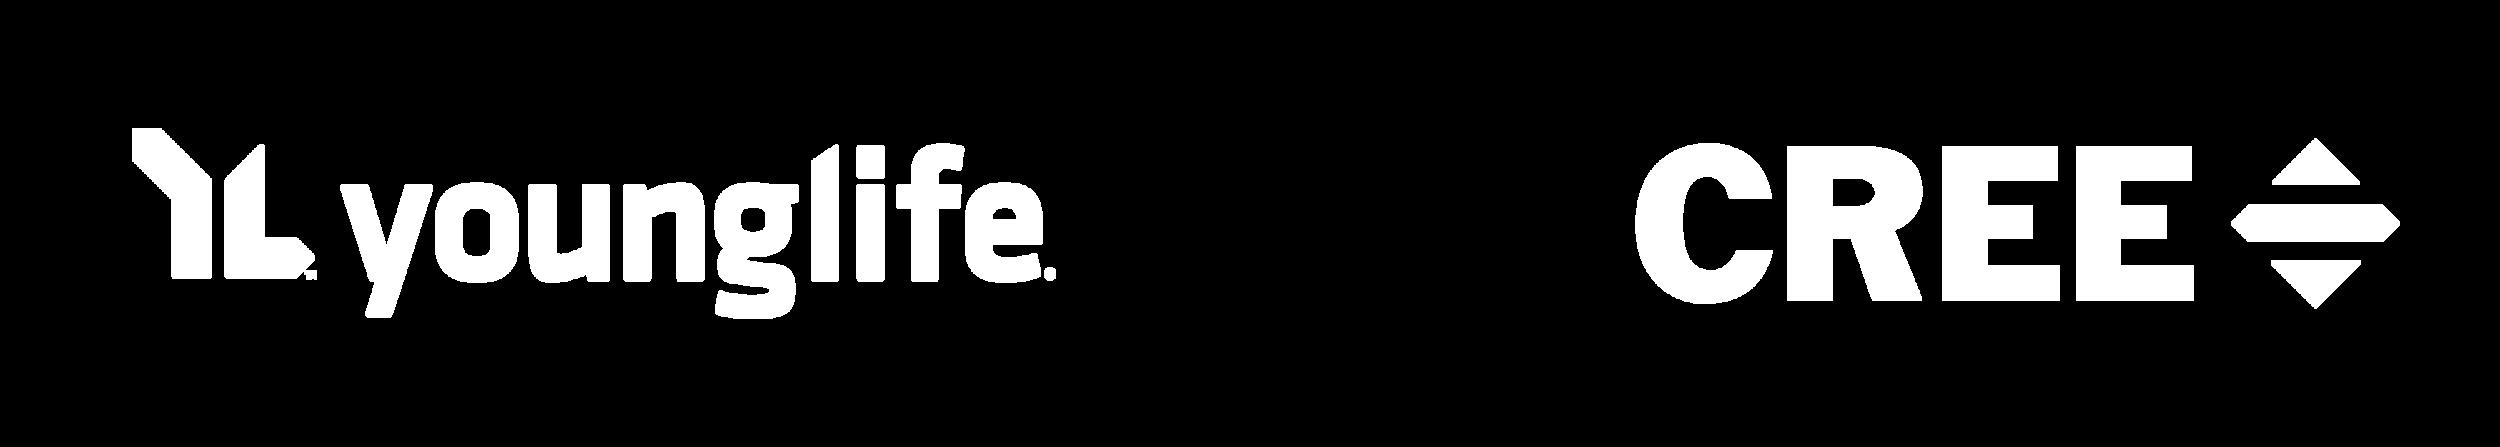 Client logos1-02.png